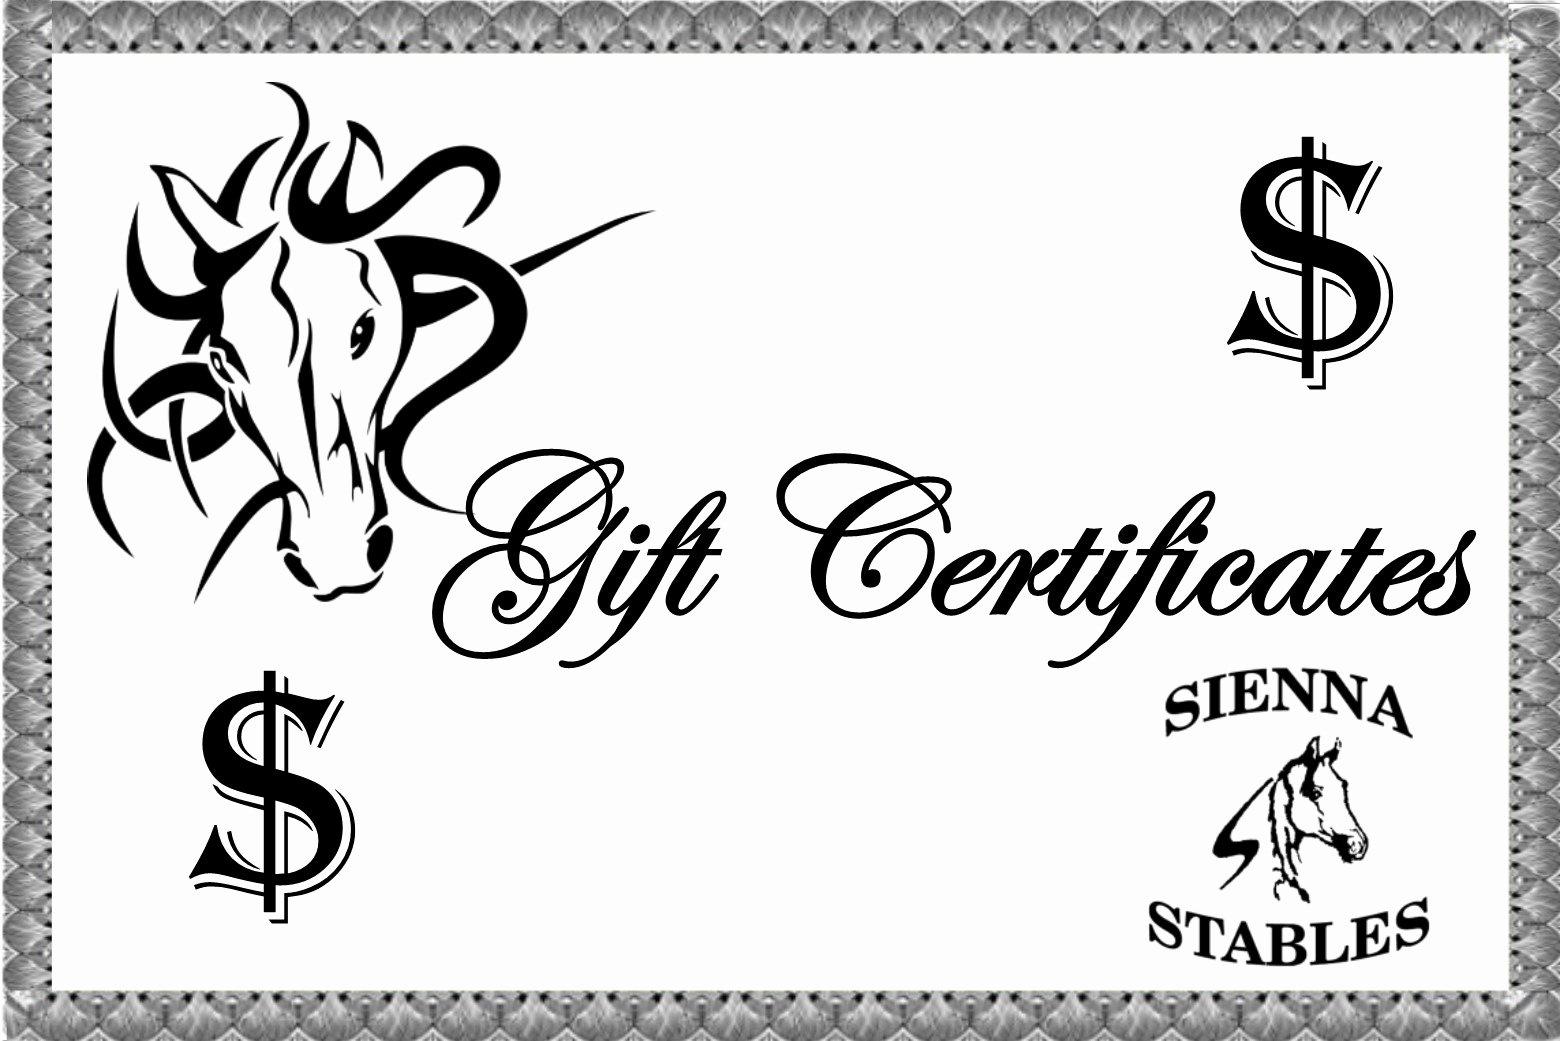 Horseback Riding Gift Certificate Template Unique Gift Certificate Template for Riding Lessons